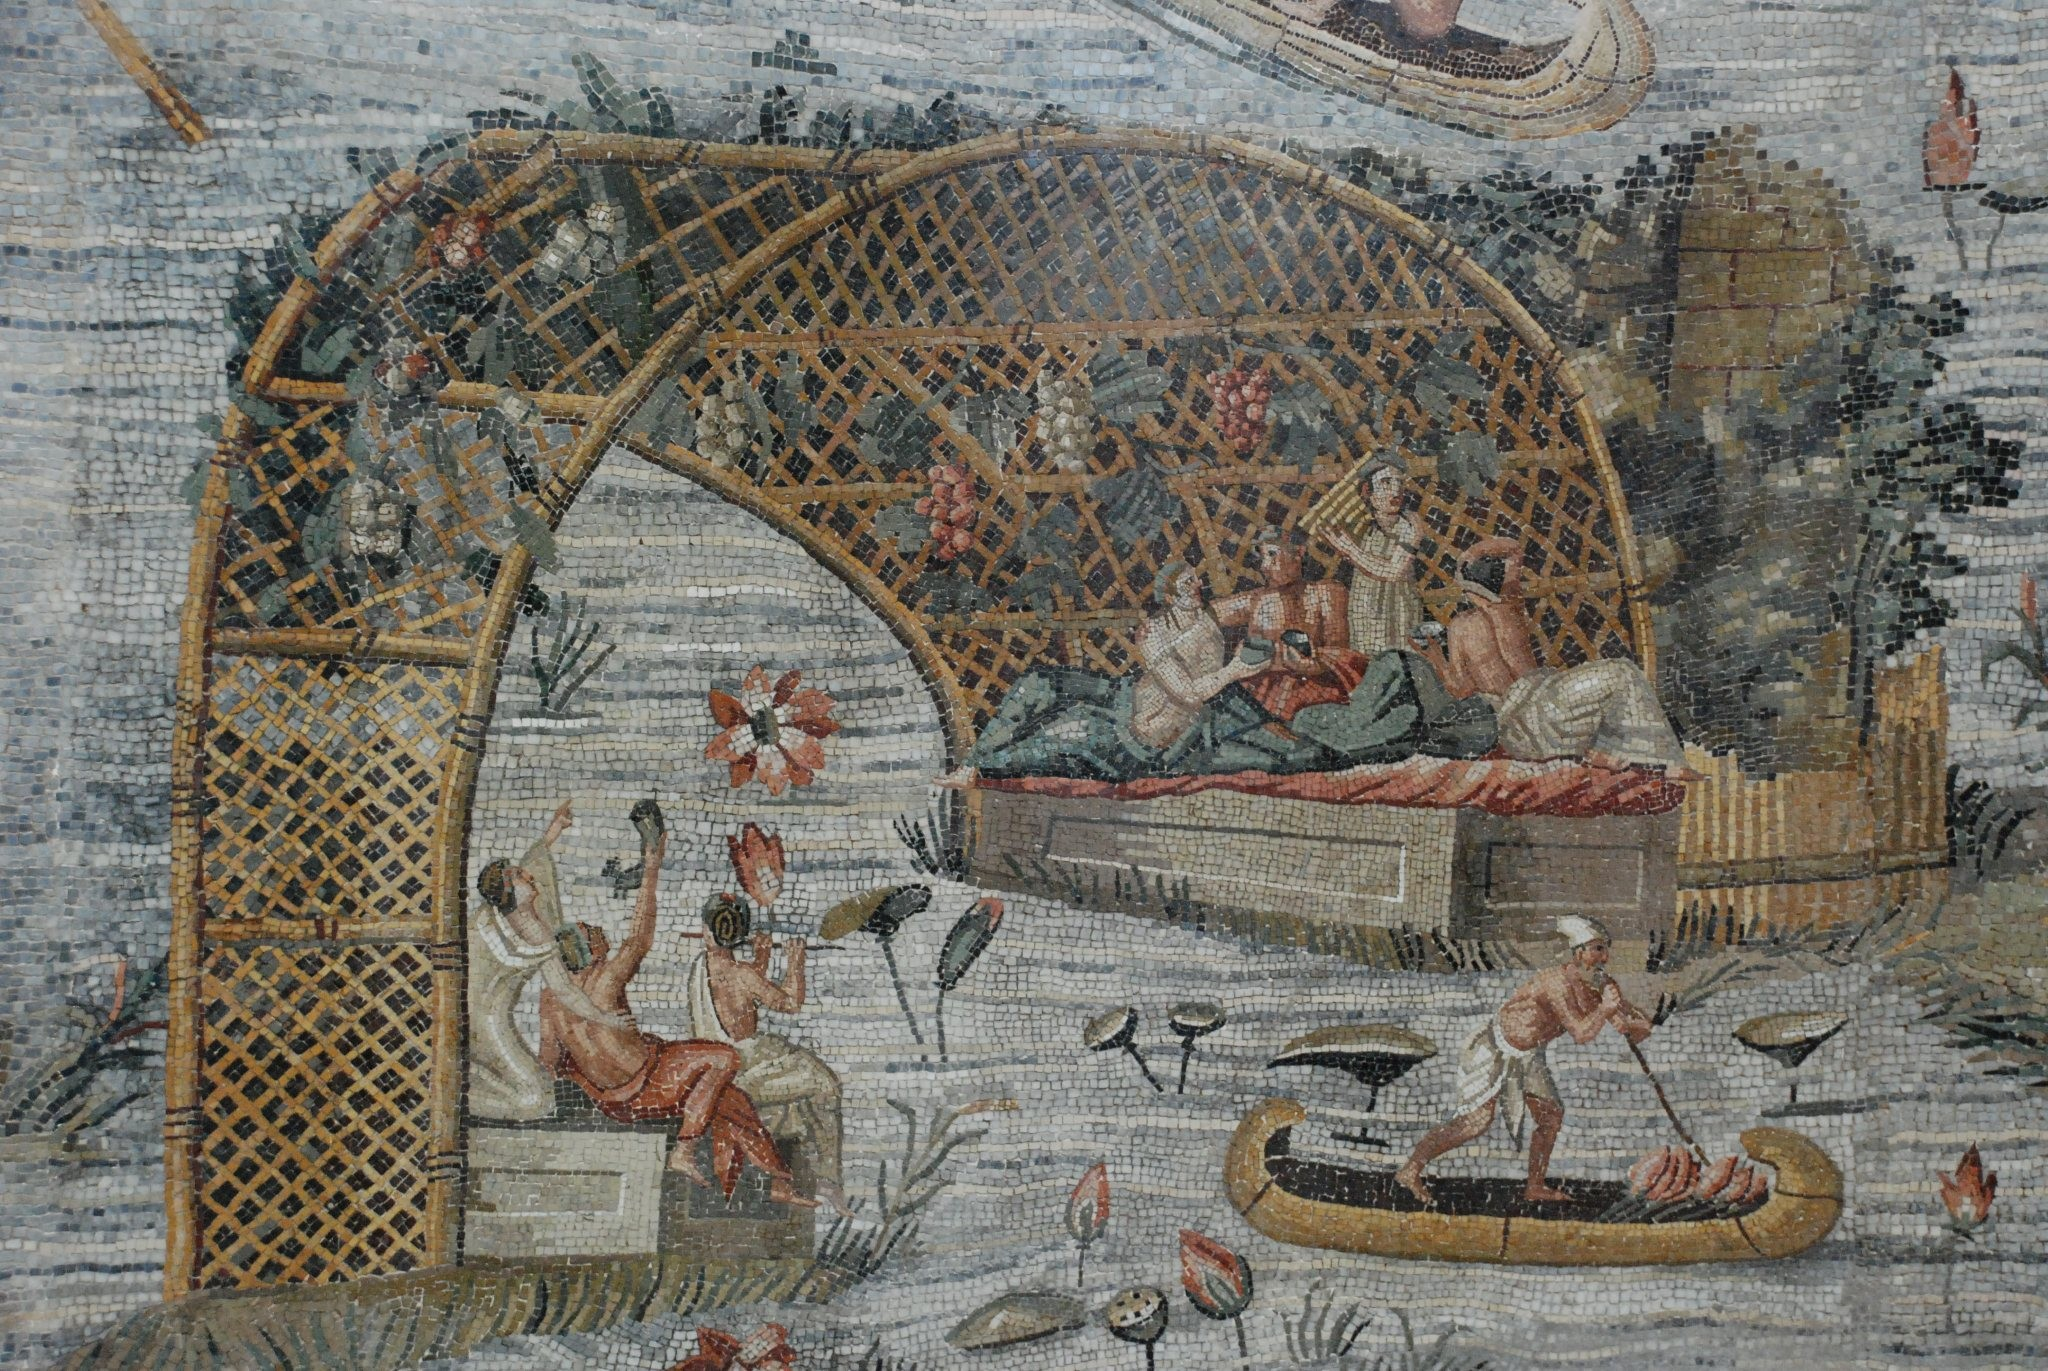 Nile_mosaic_in_Palestrina_detail_8.jpg